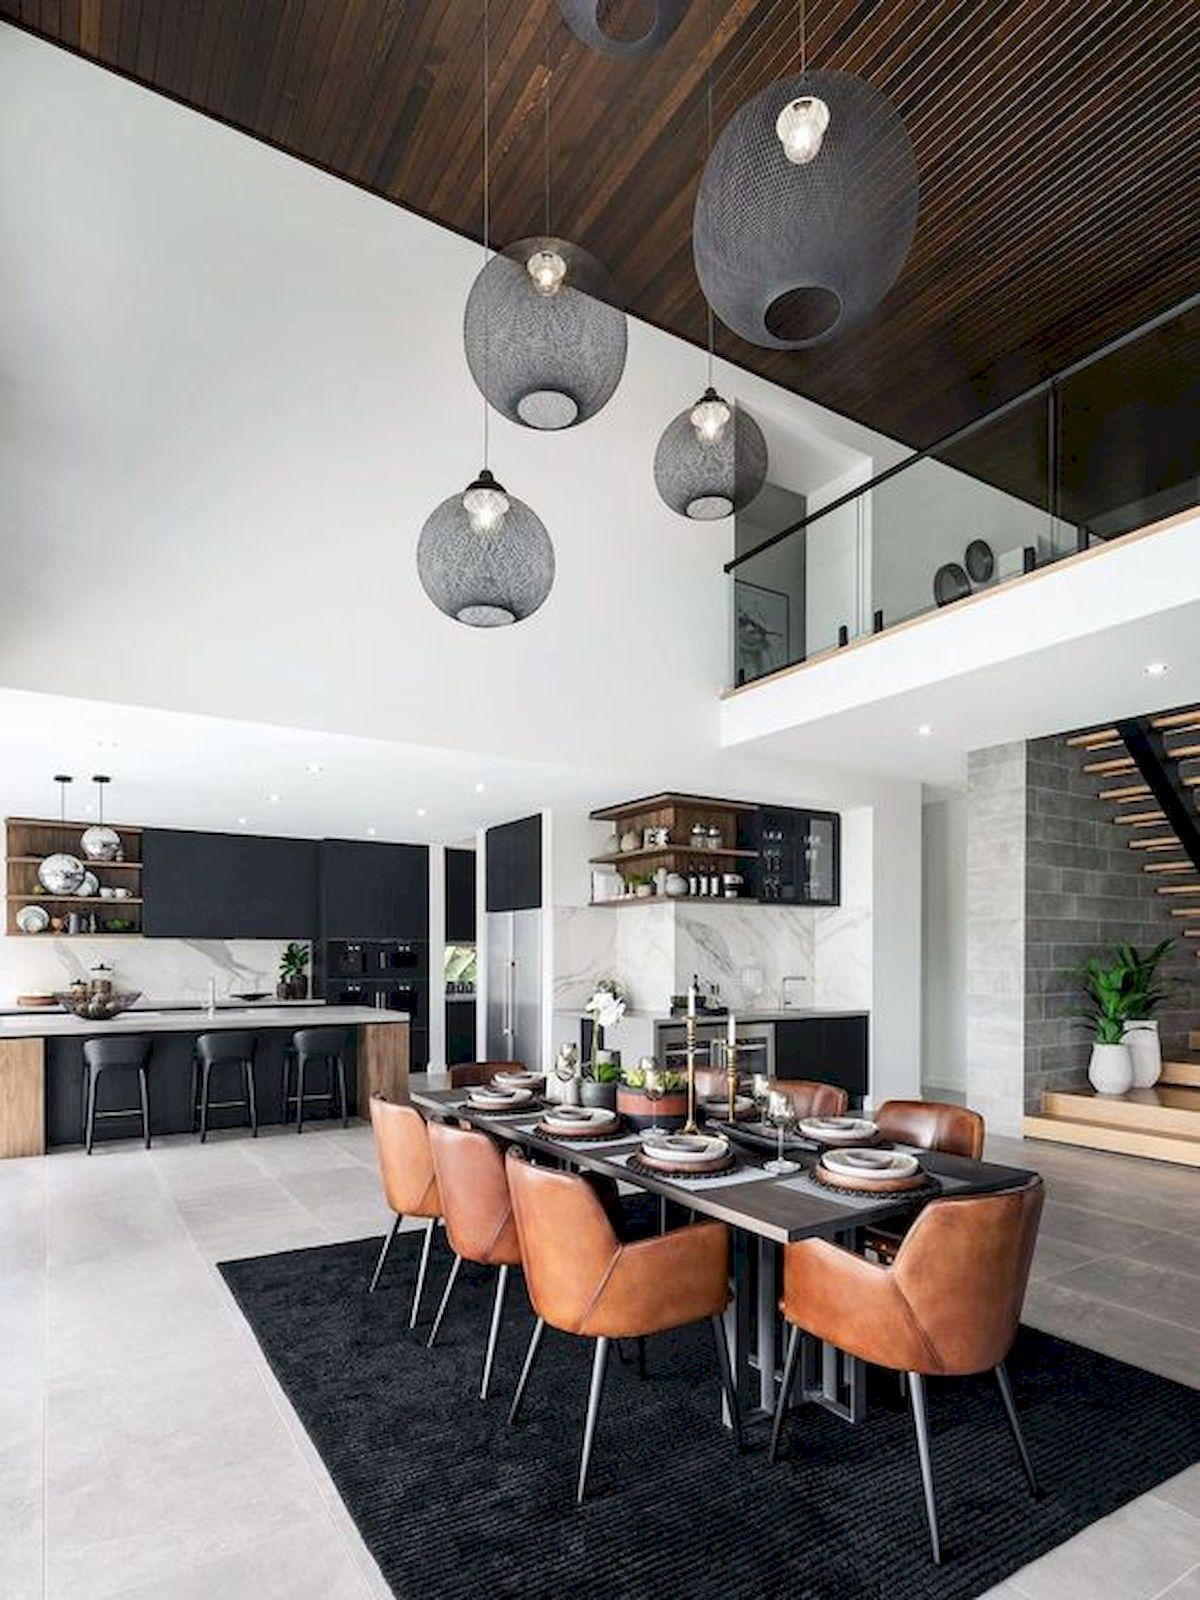 80 Elegant Modern Dining Room Design And Decor Ideas (39)